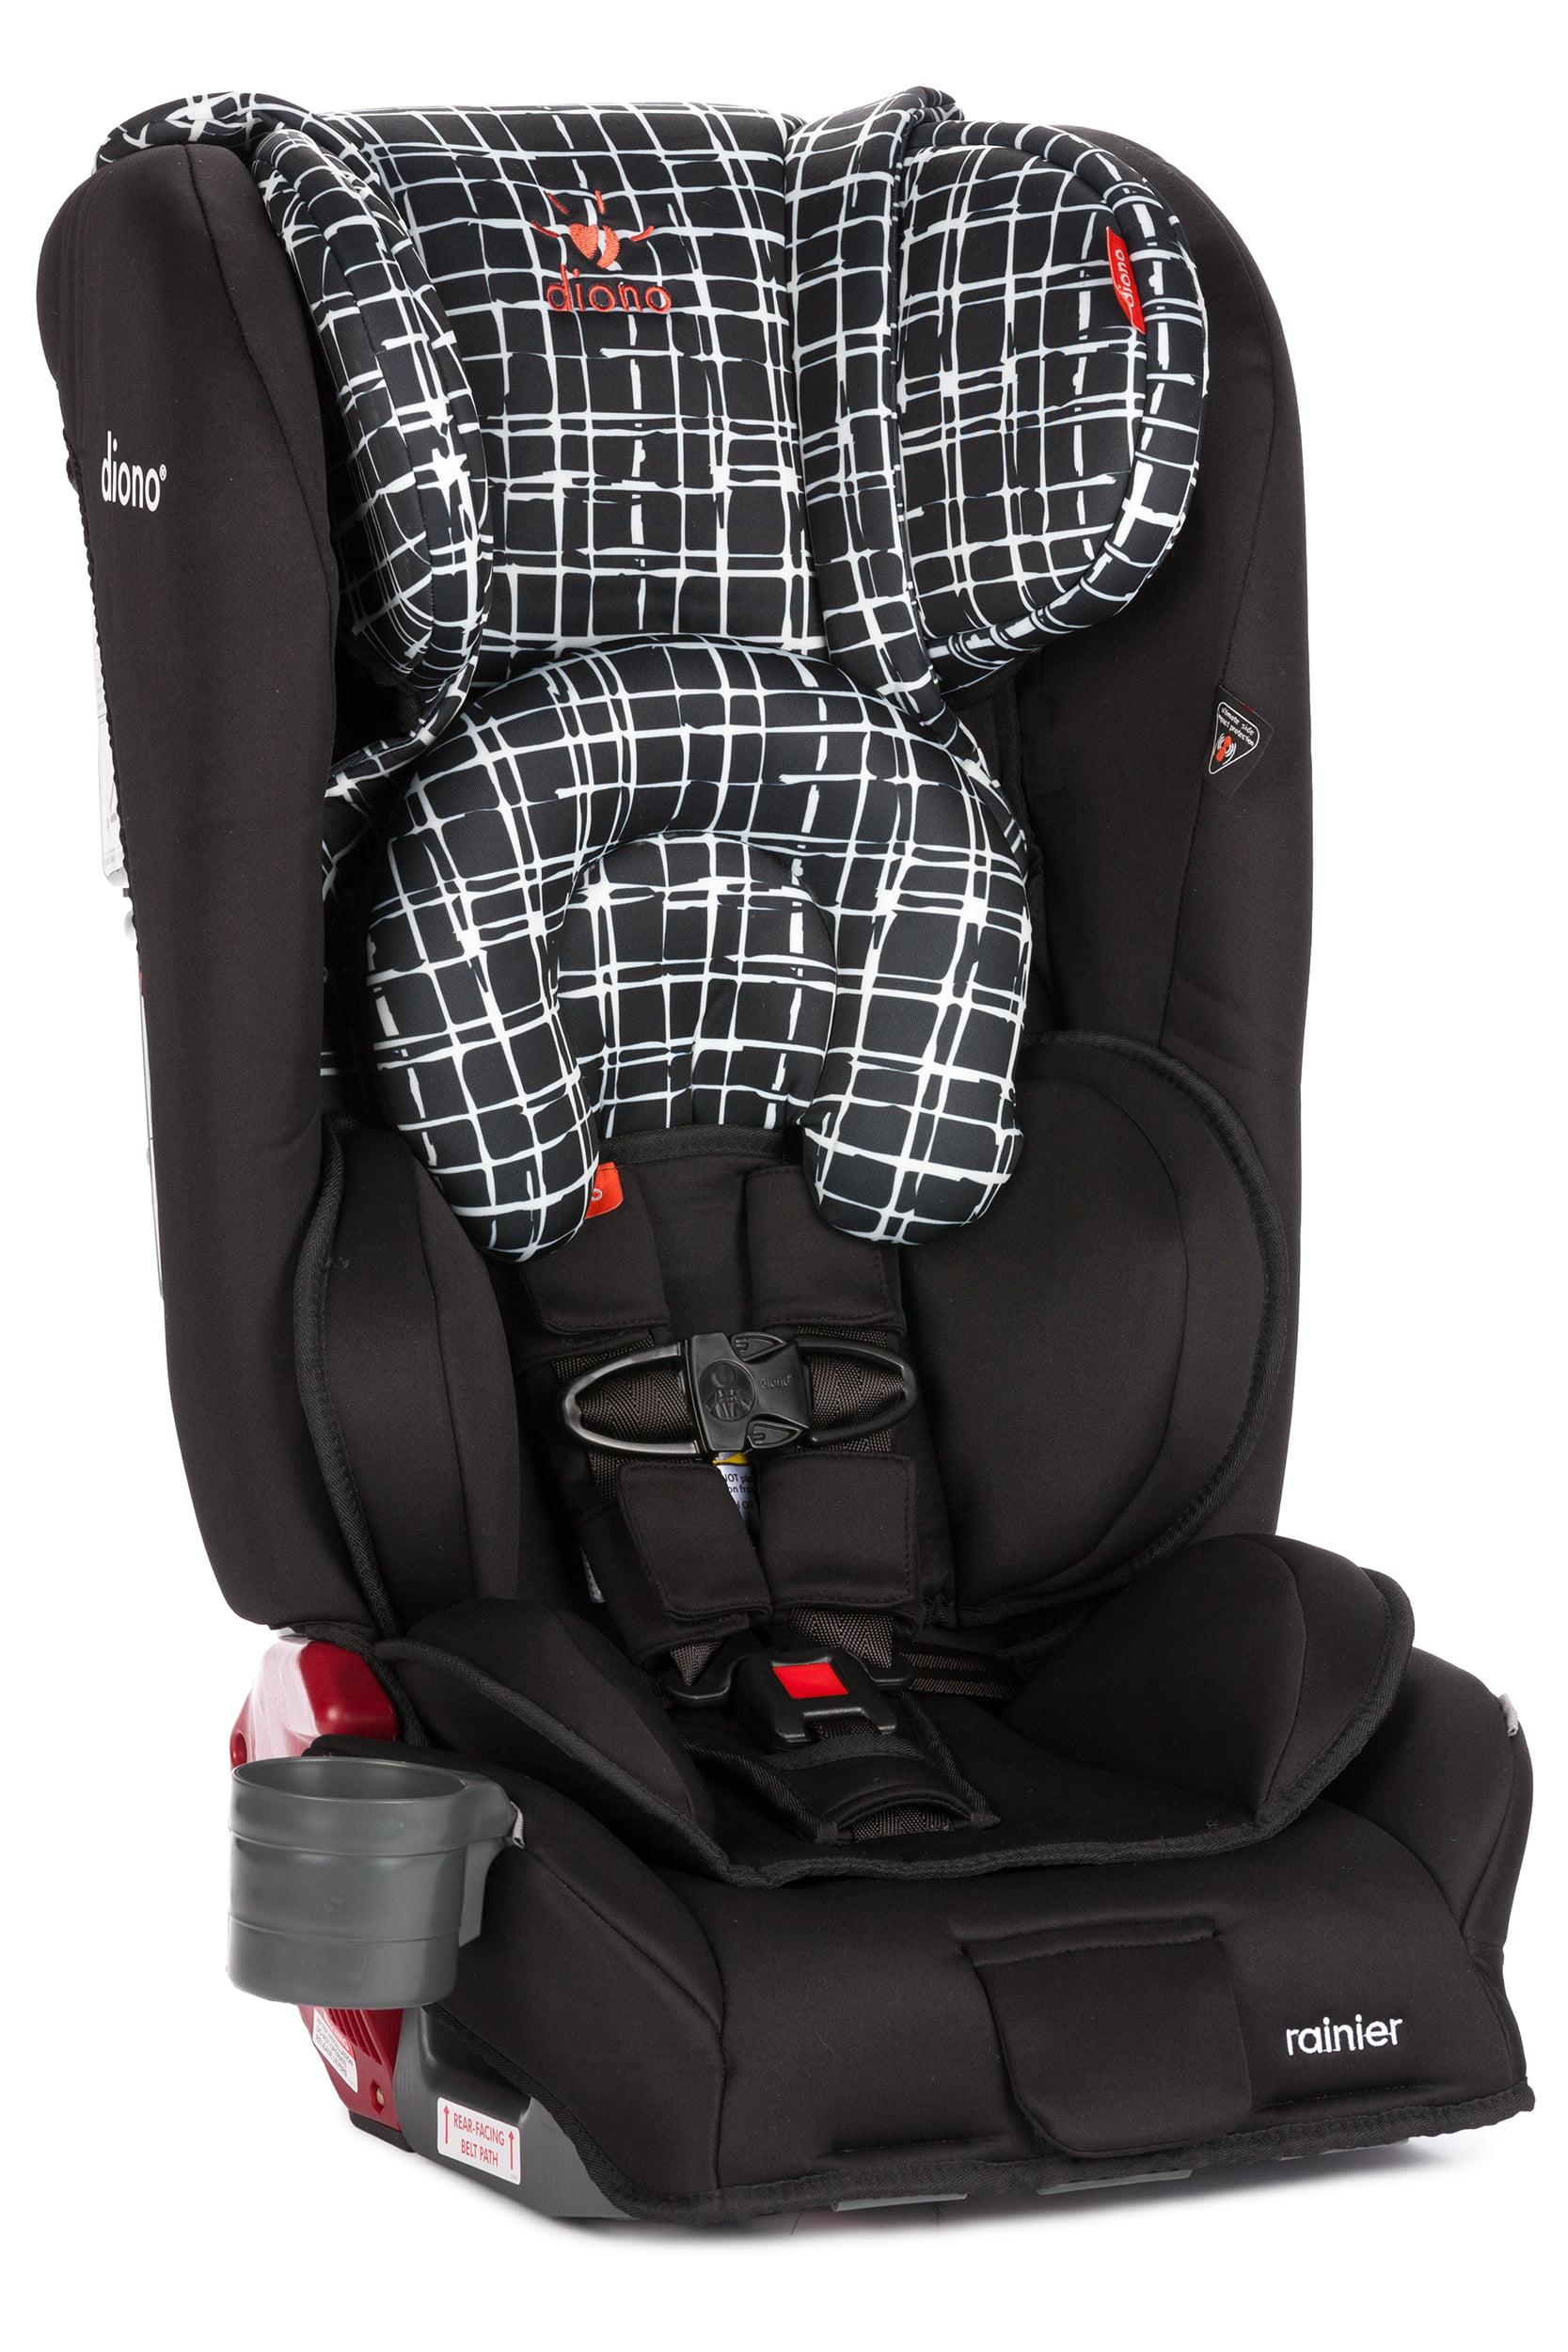 Diono Rainier All-in-One Car Seat, Black Plum by Diono